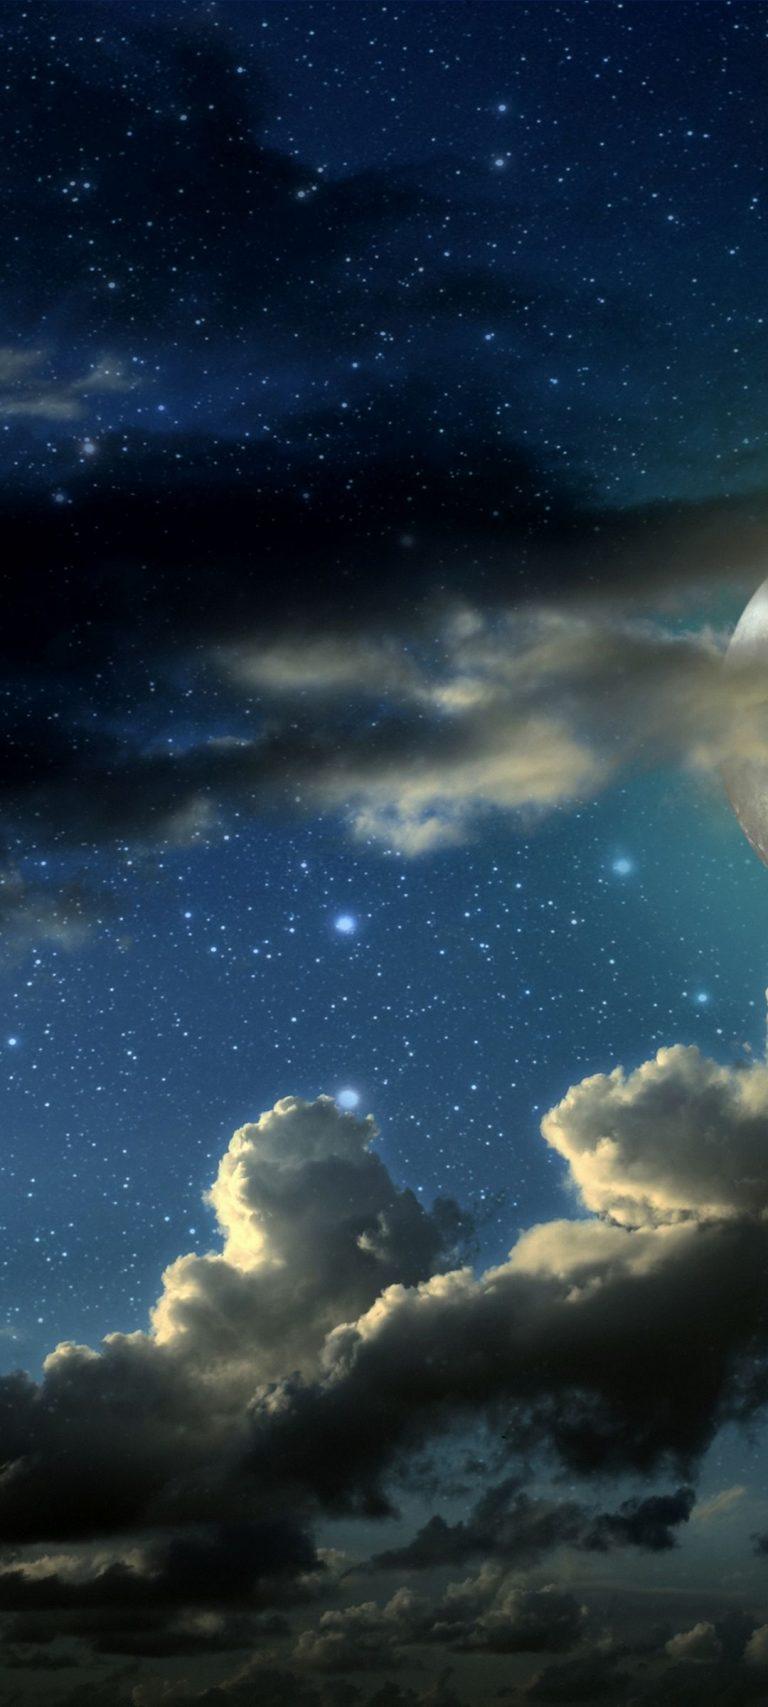 Full Moon Stars Clouds Shadows 1080x2400 768x1707